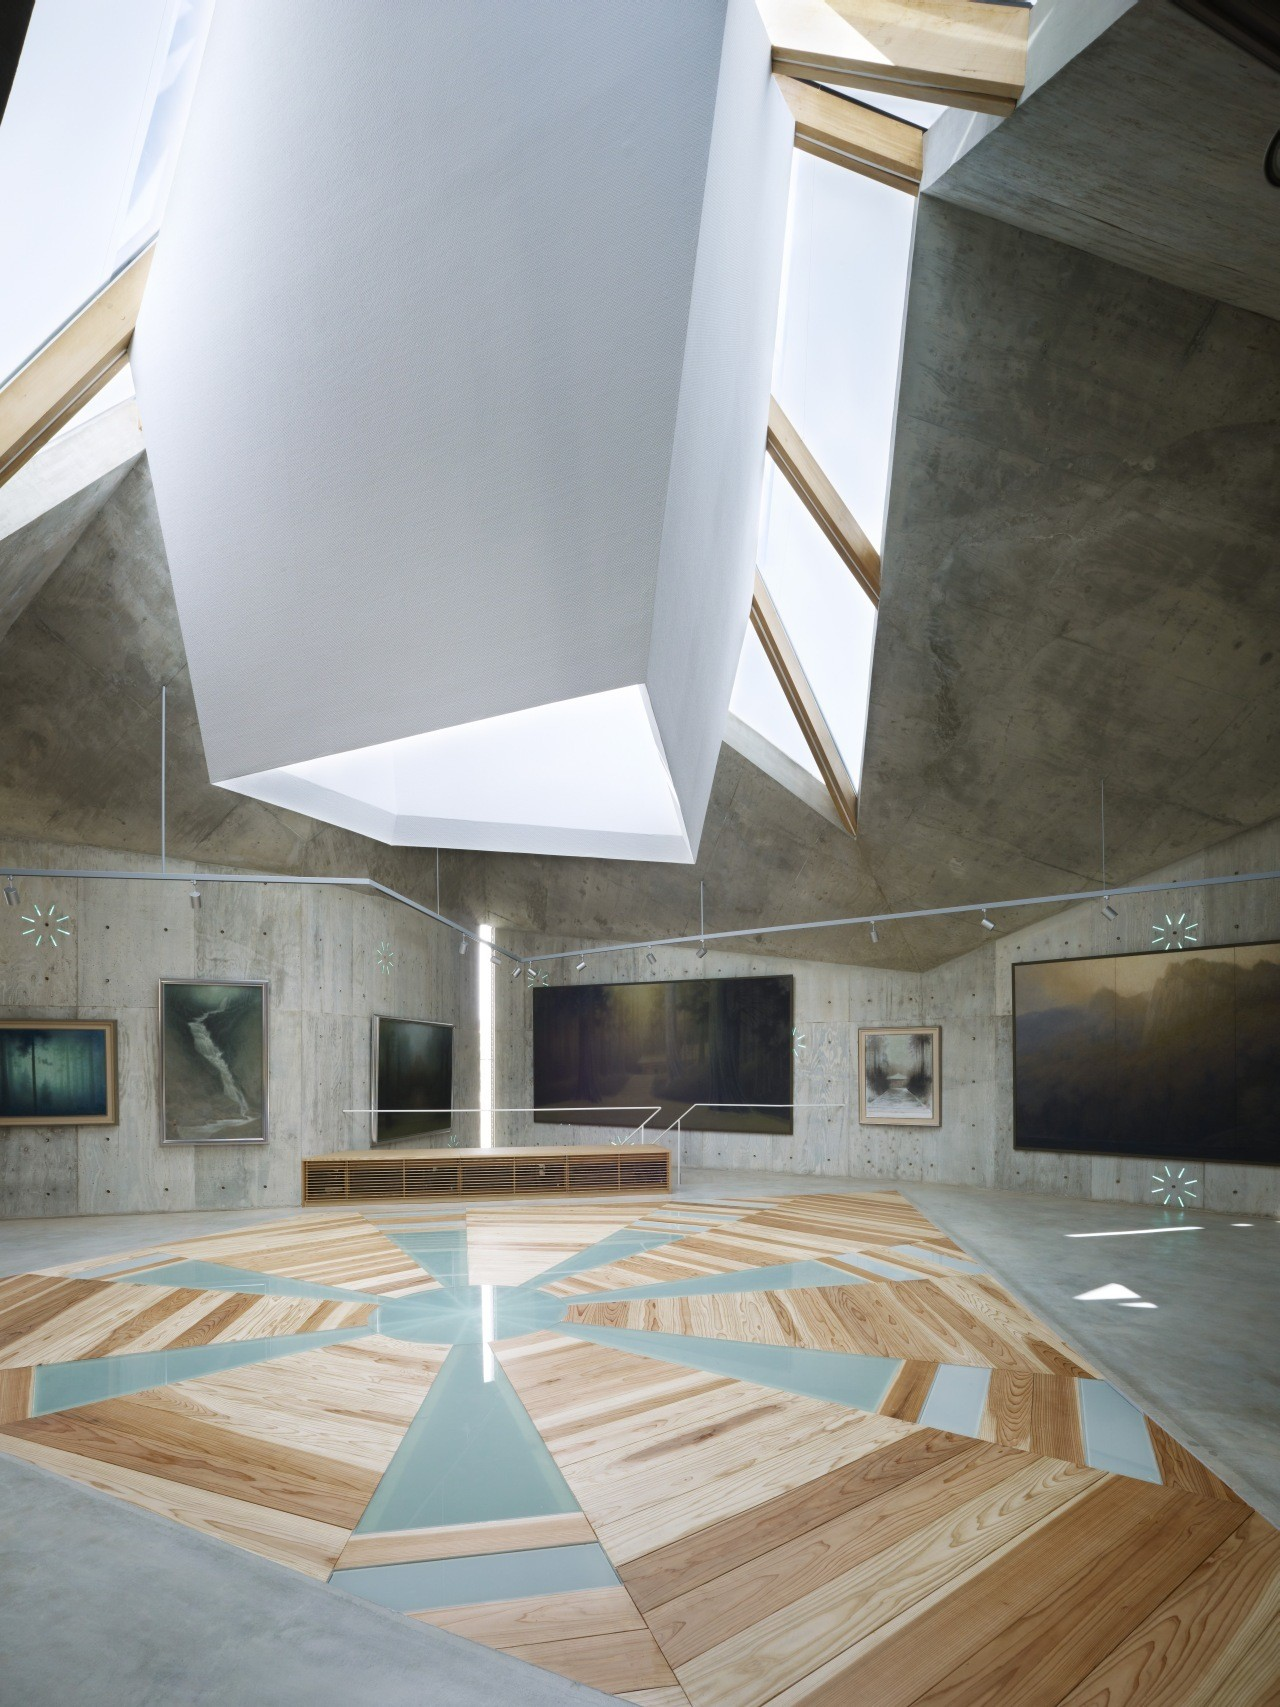 Mecenat Art Museum Naf Architect & Design - 9